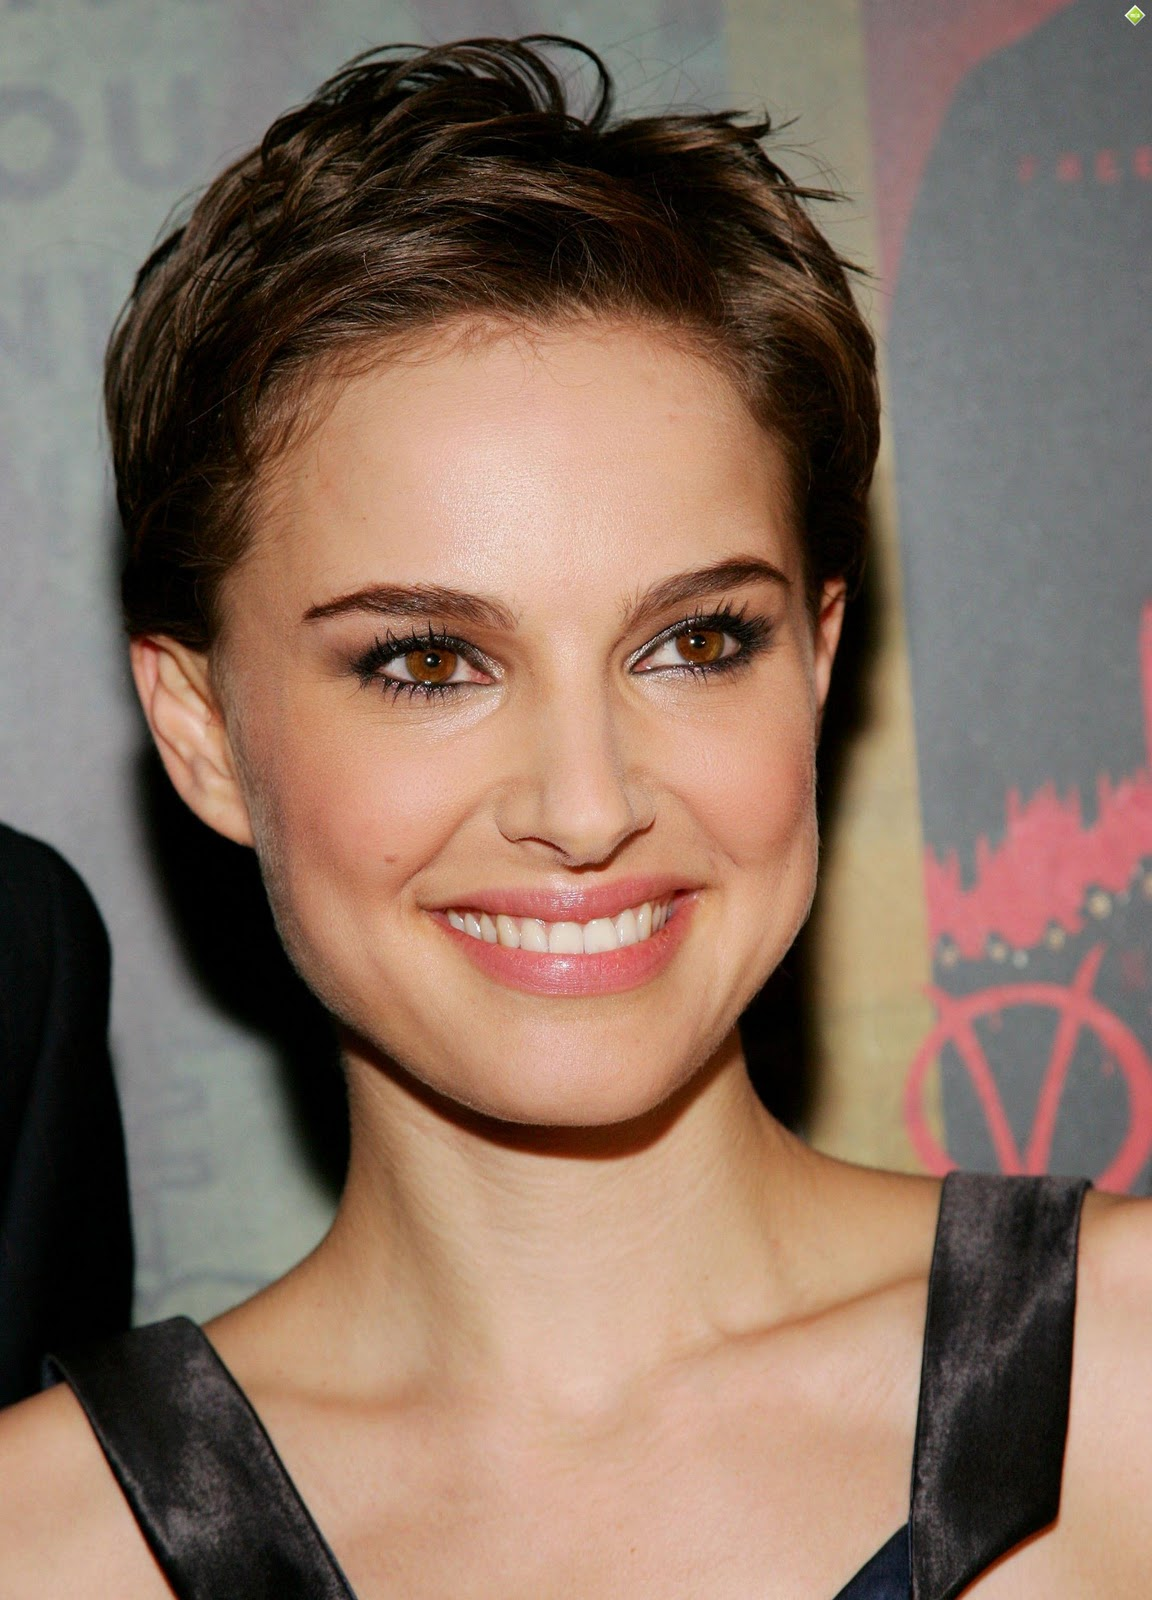 Natalie Portman Short Hair Design Ideas